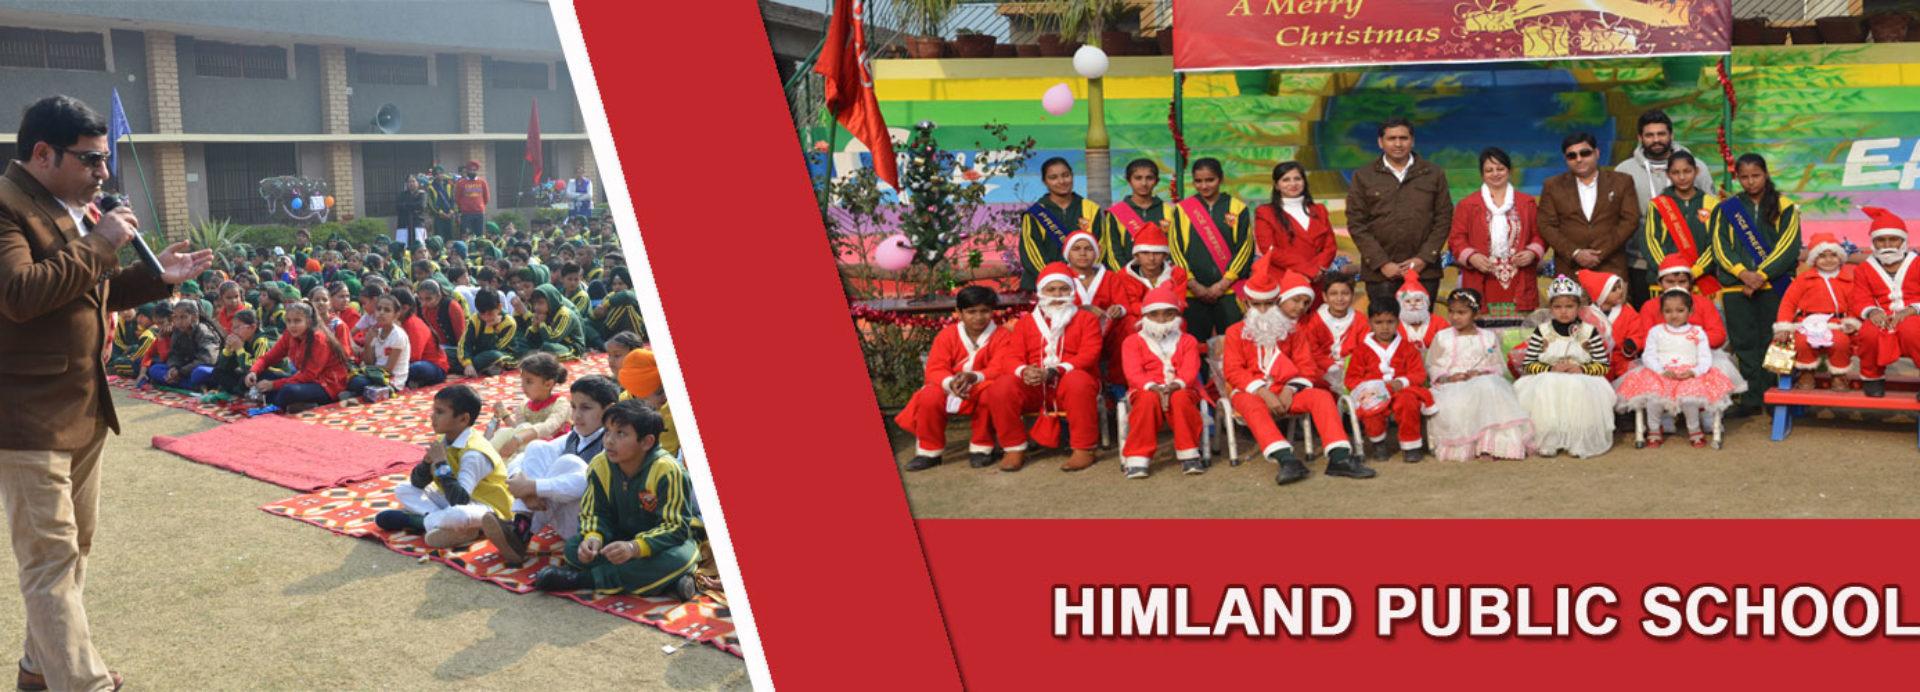 Himland Public School